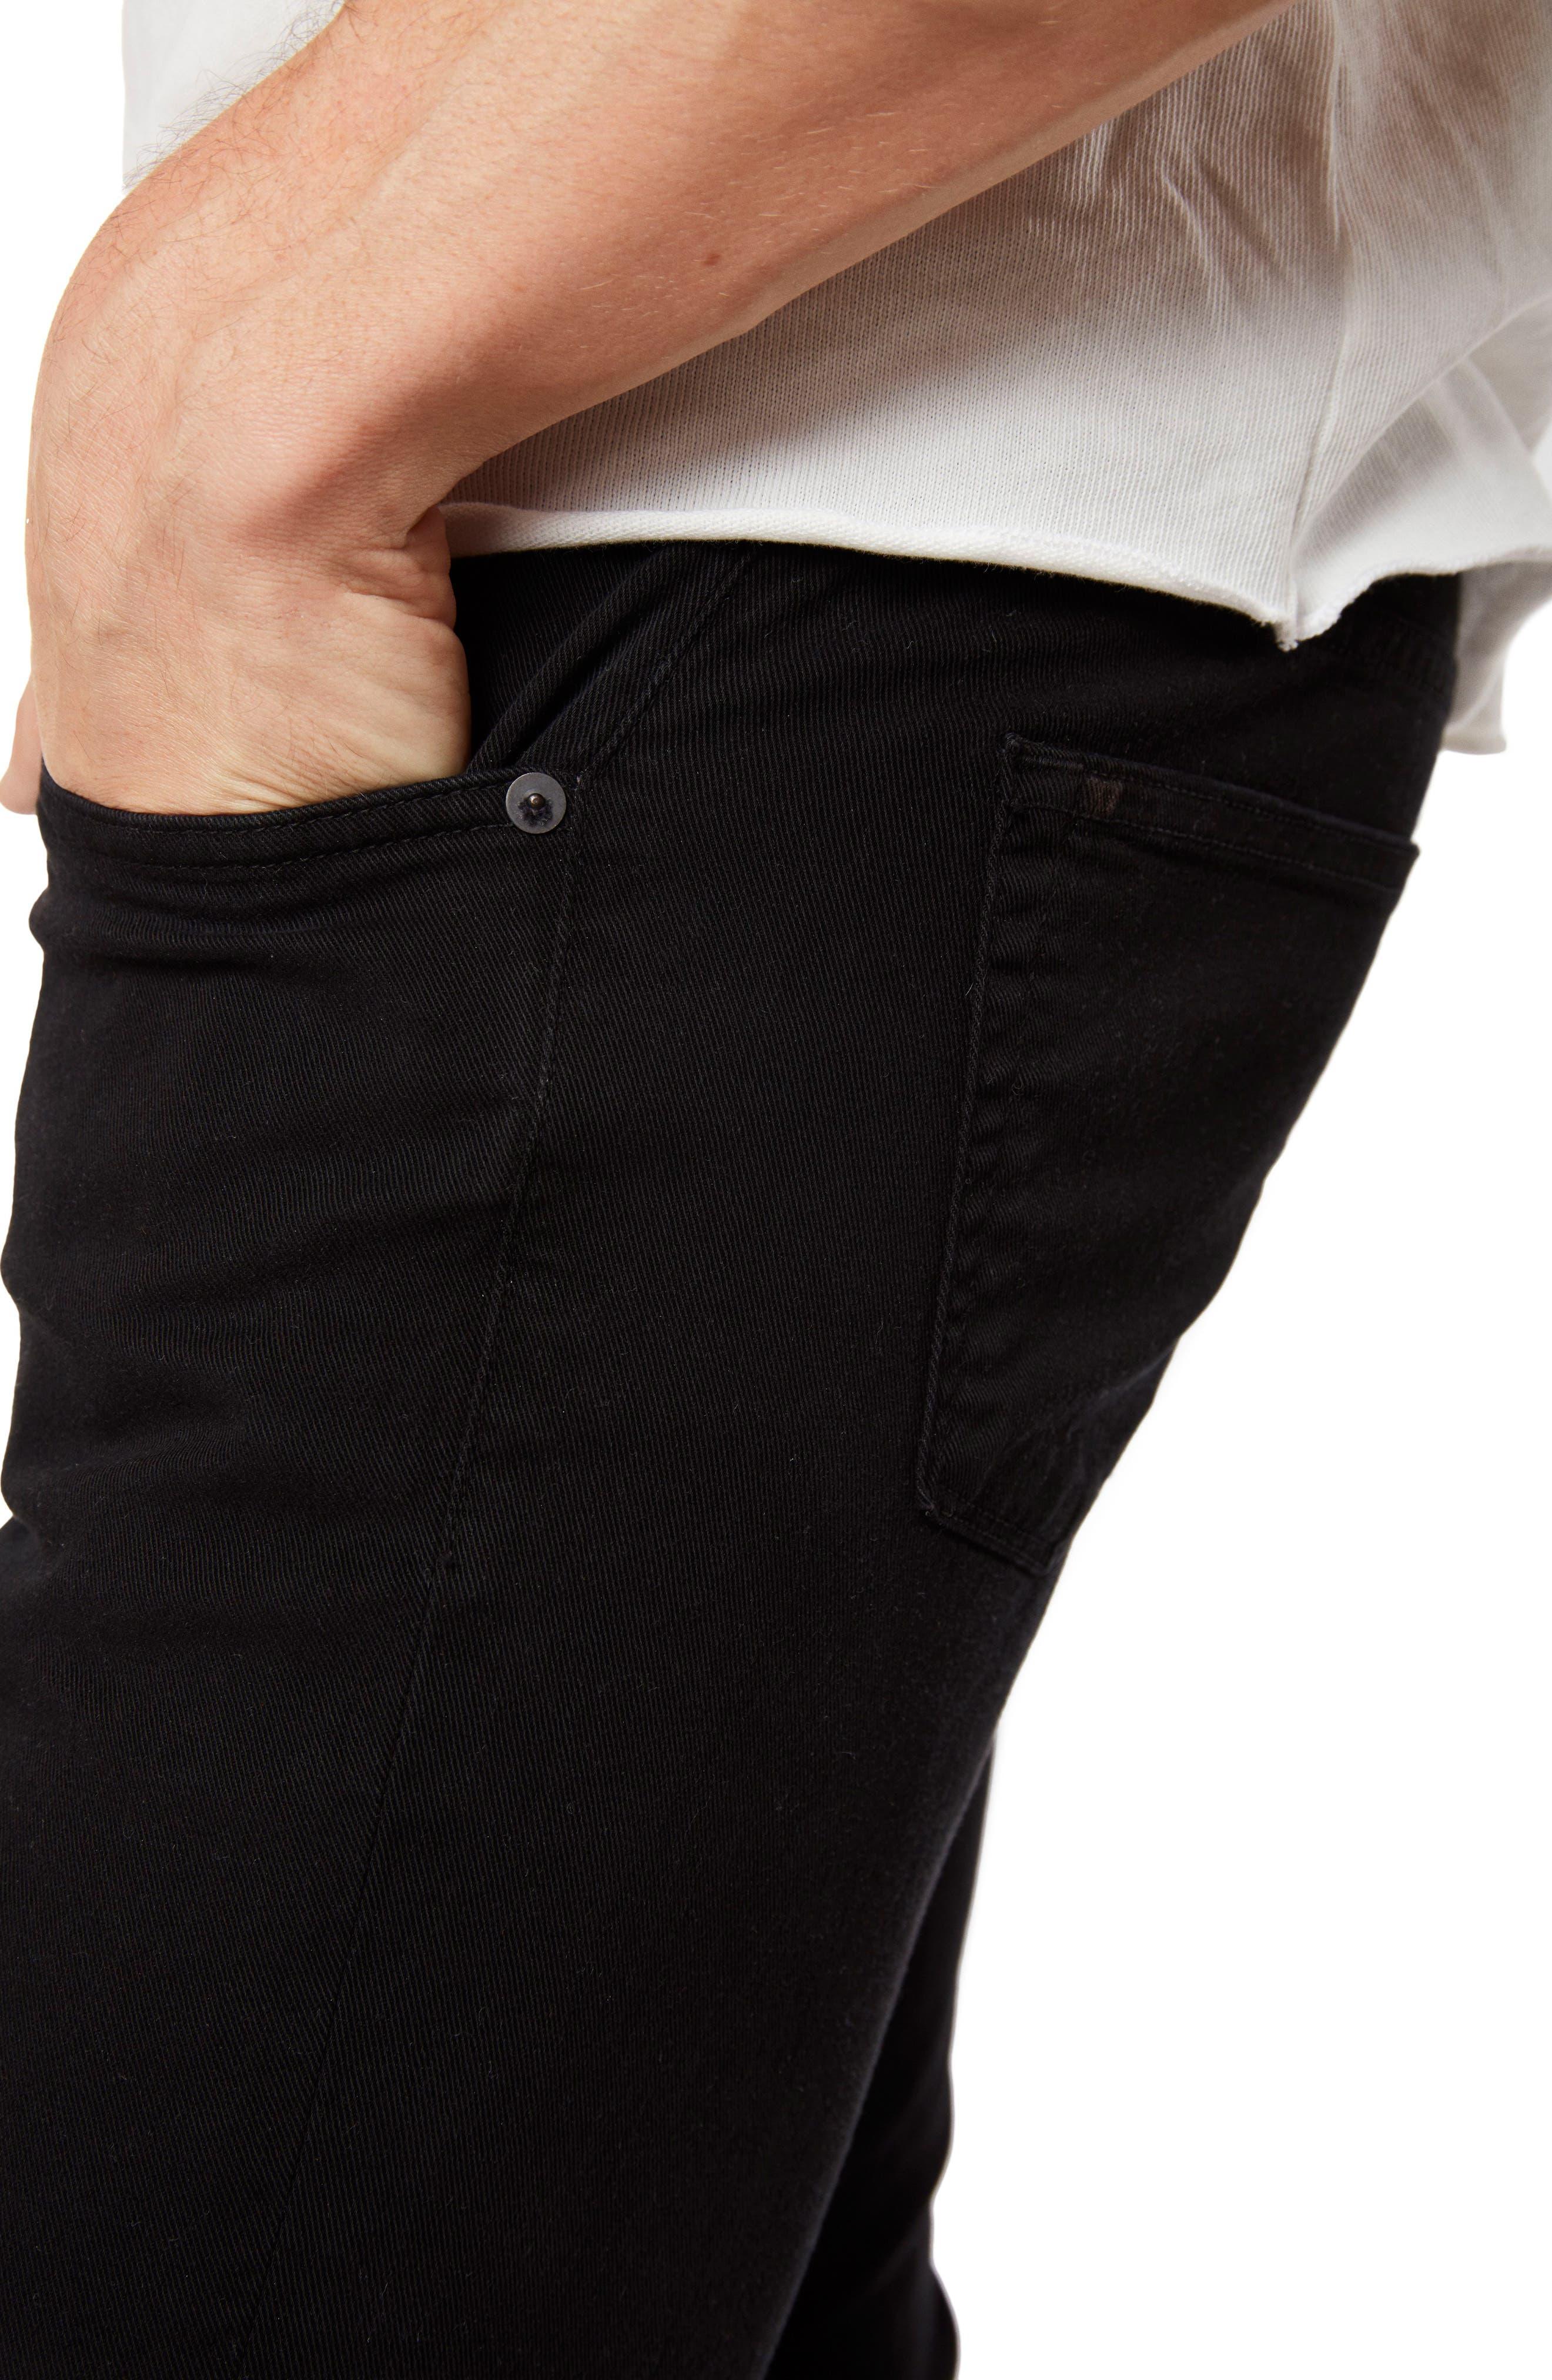 Mick Skinny Fit Jeans,                             Alternate thumbnail 5, color,                             001